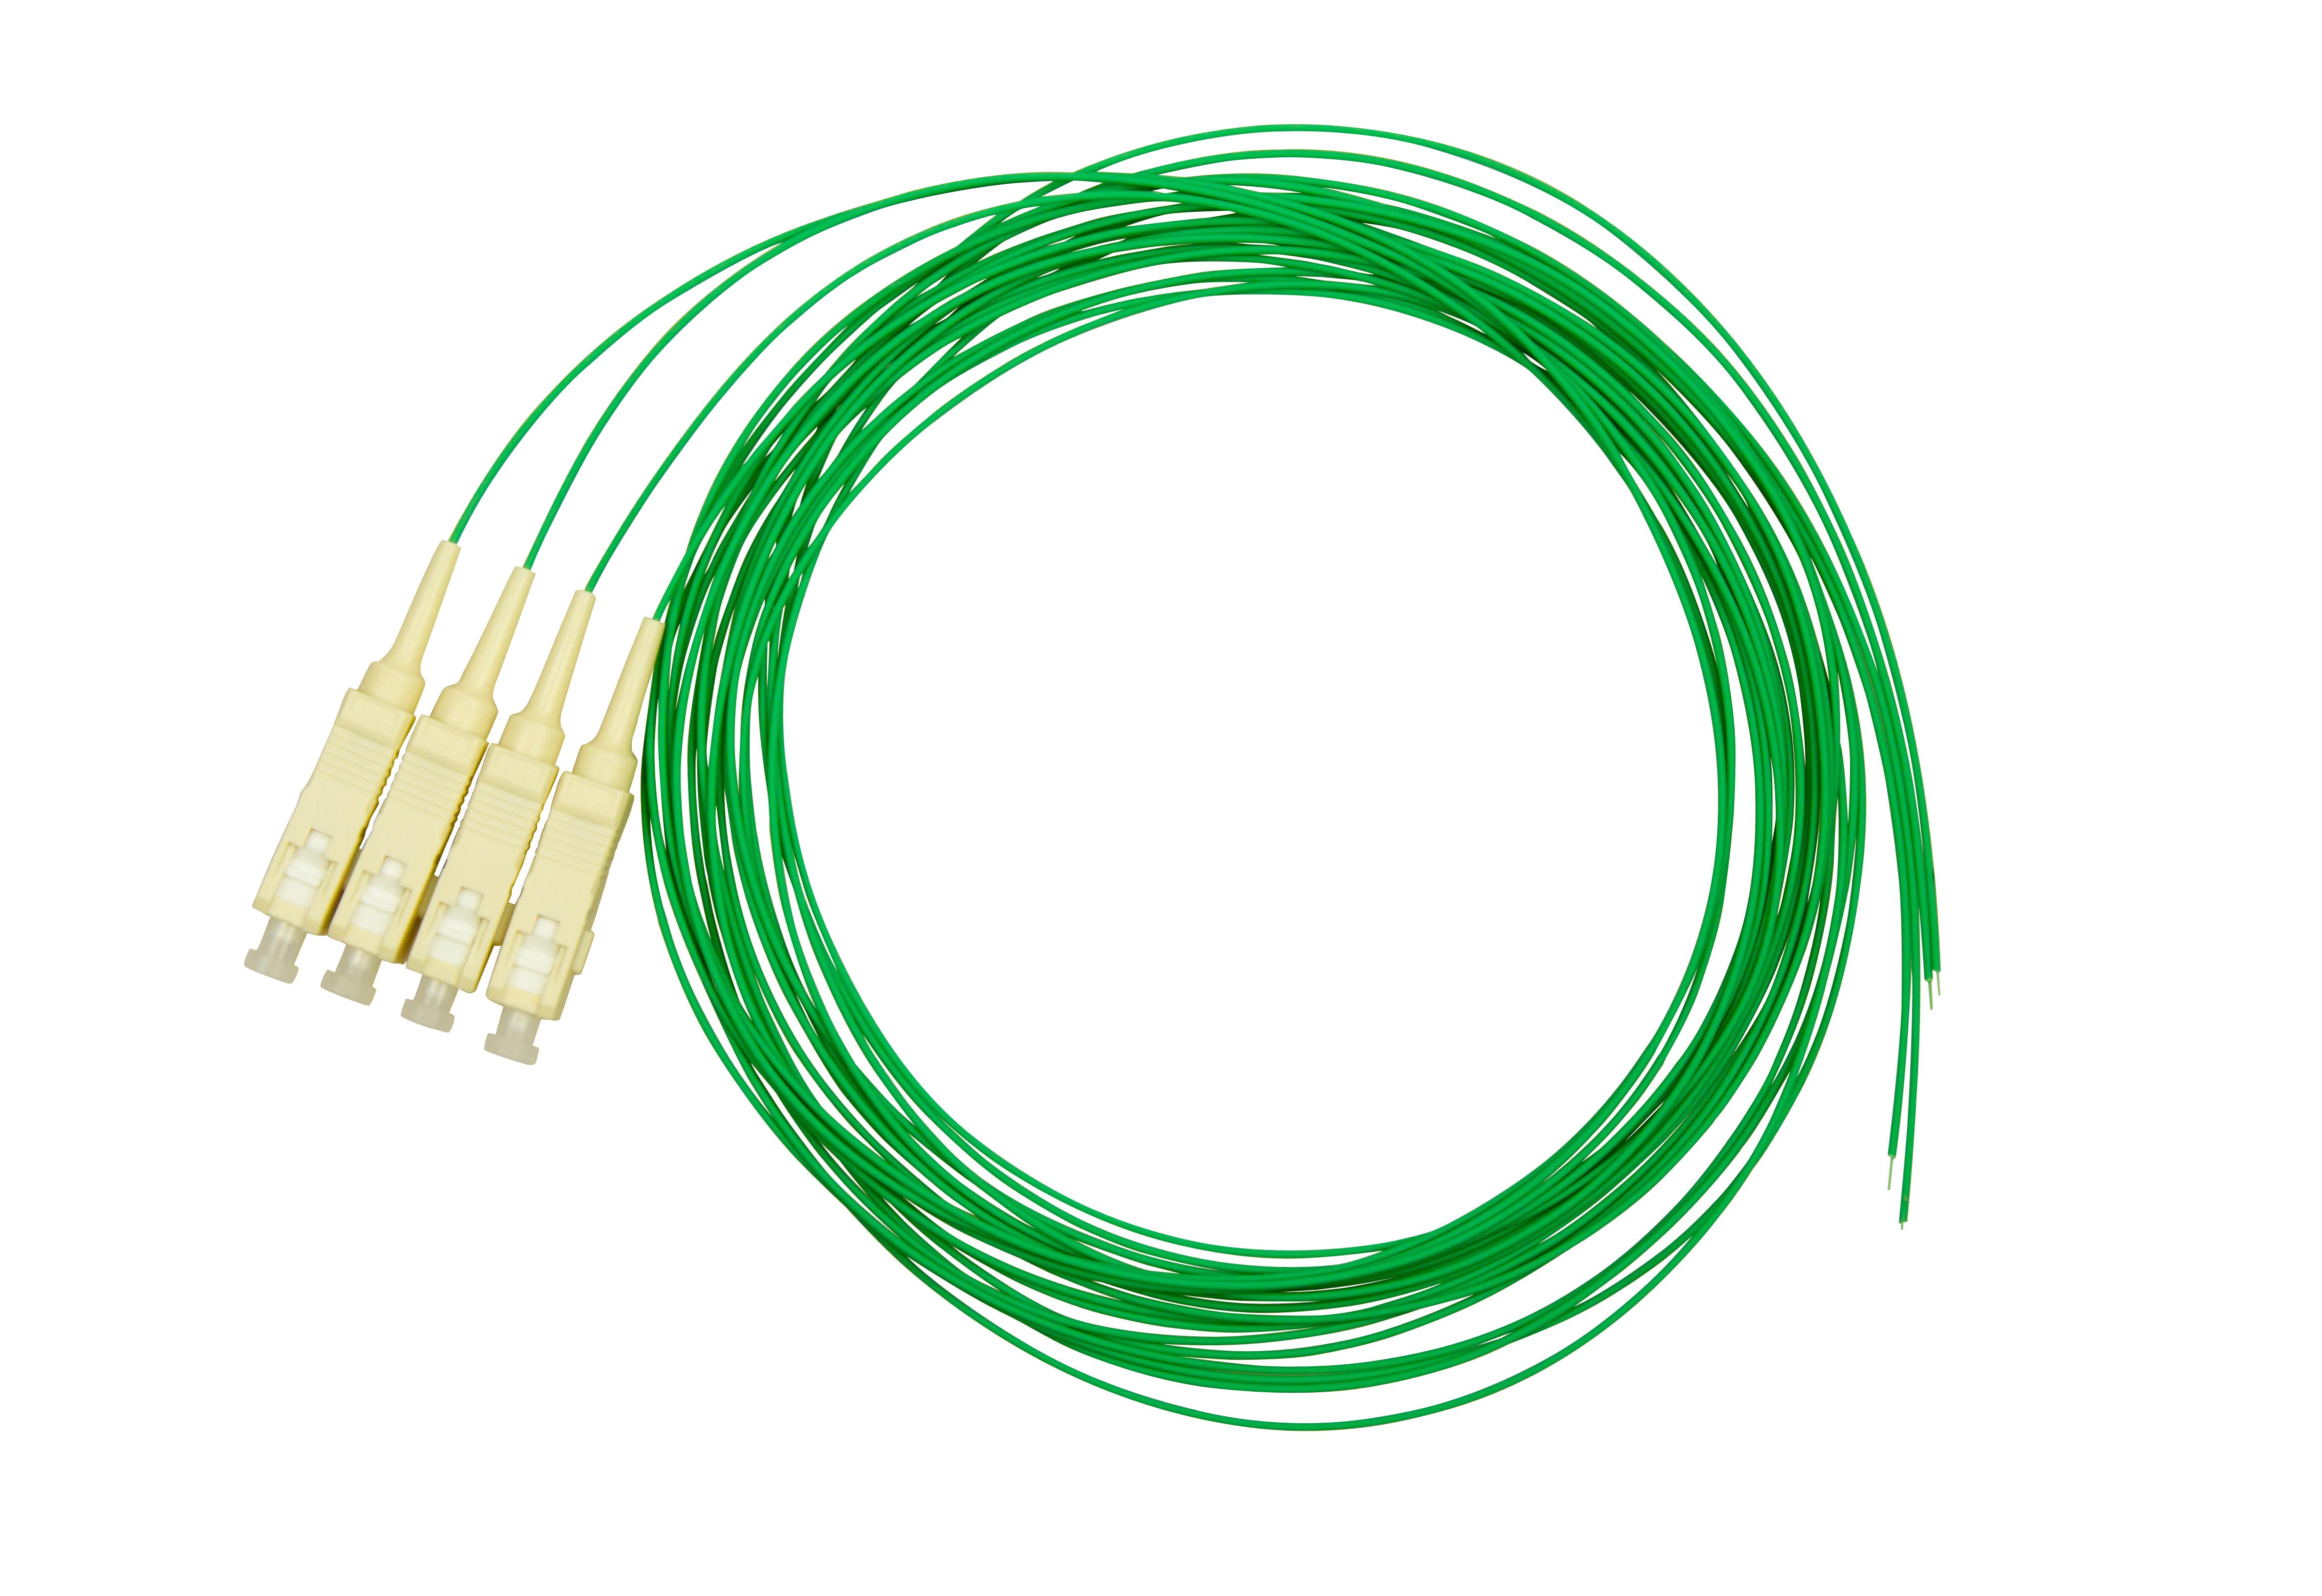 1 VE LWL Pigtail SC, 50/125µm OM2, 2.0m, Easy Strip, grün, 4Stk HLP05C002E